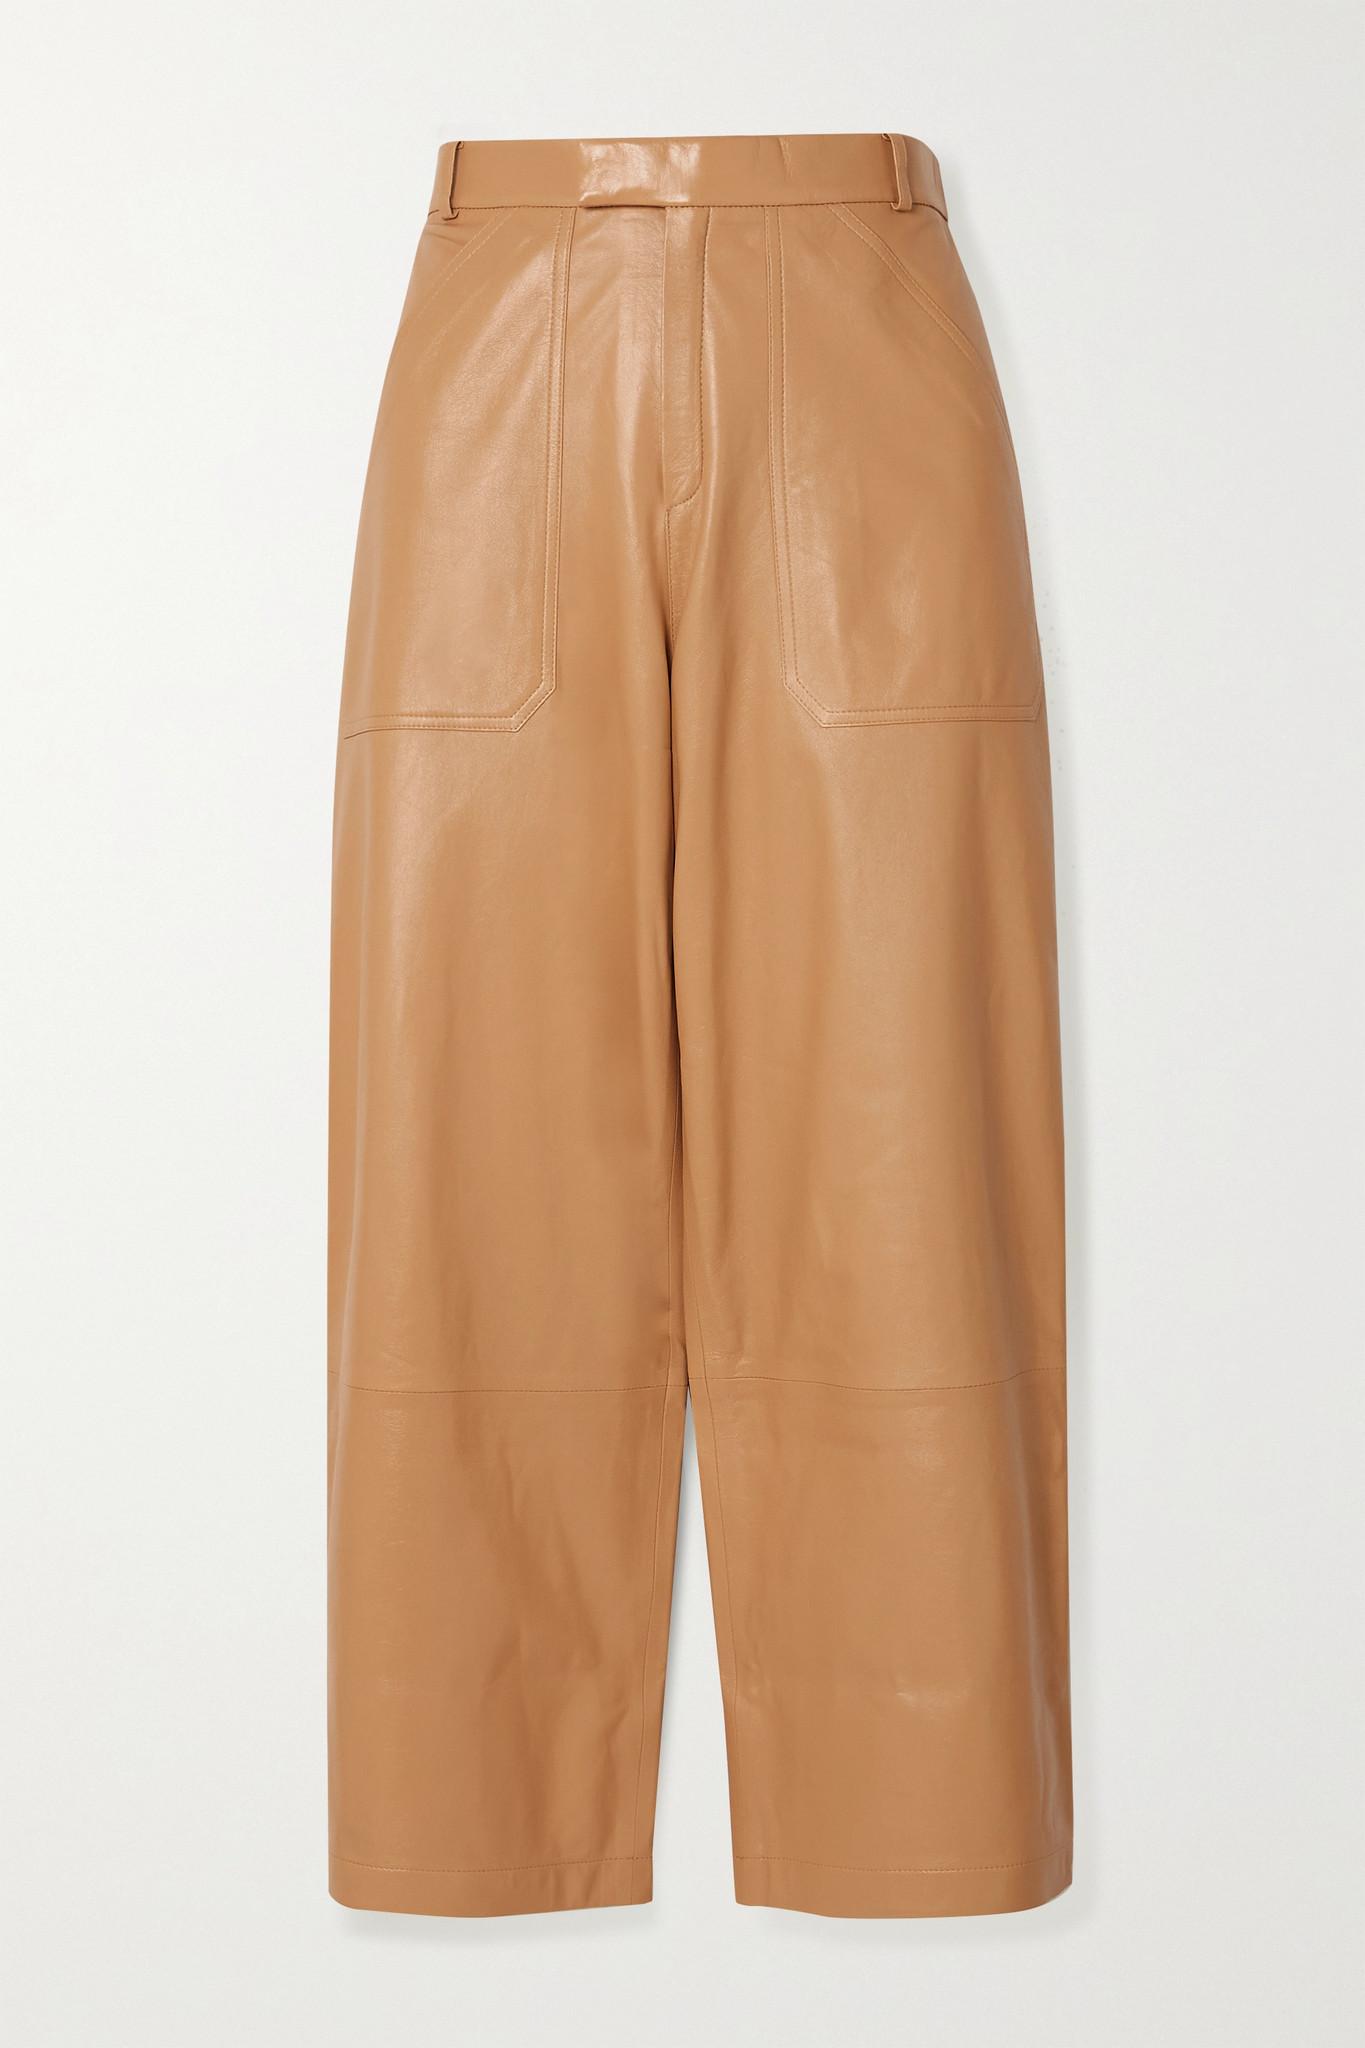 ZEYNEP ARCAY - Cropped Leather Straight-leg Pants - Neutrals - US2